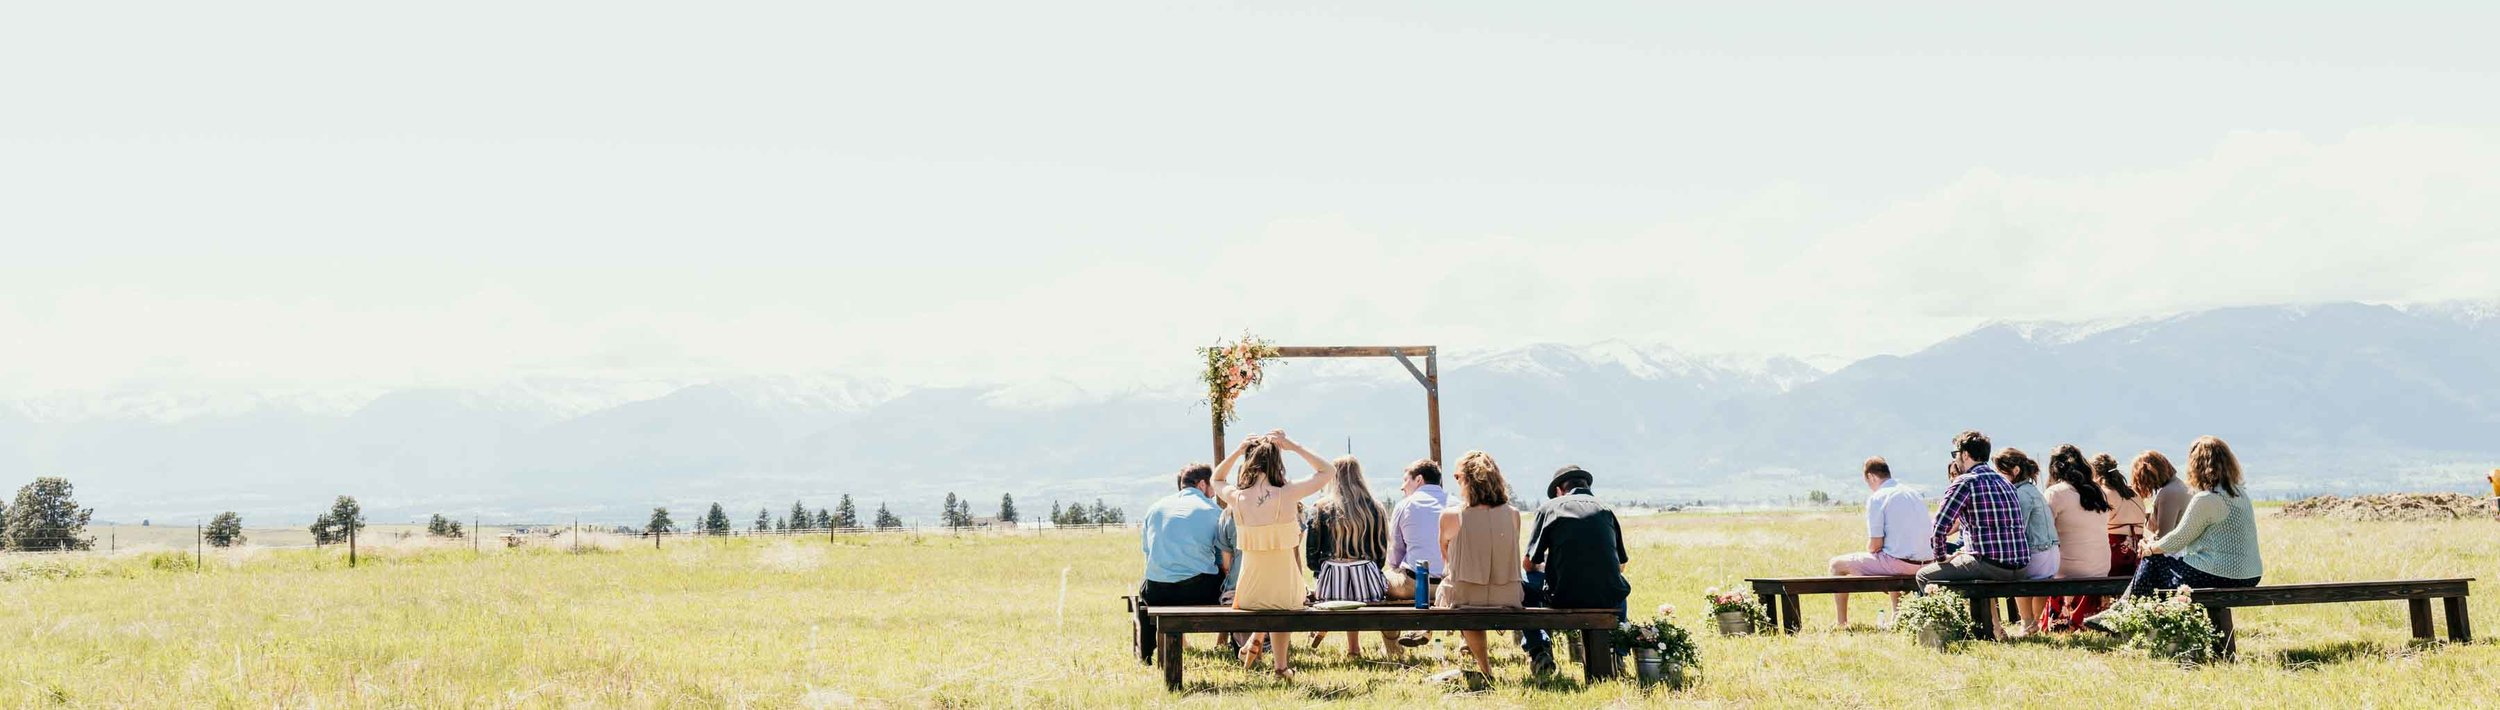 158 Montana Wedding Photographer_Doherty 2018-1498-Pano.jpg